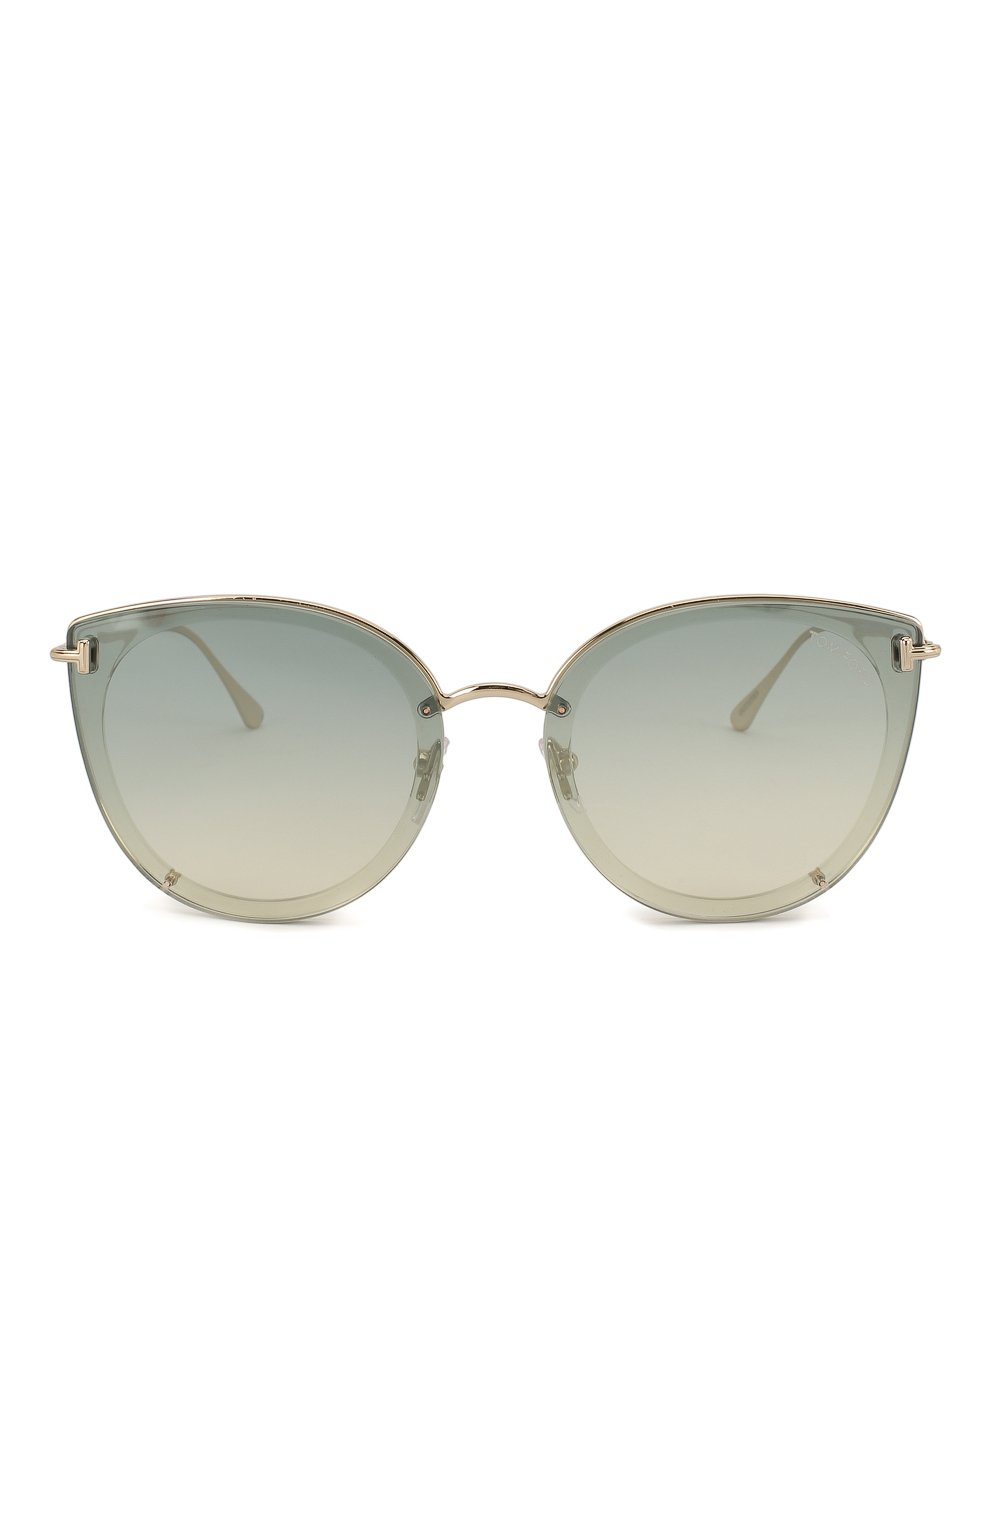 Женские солнцезащитные очки TOM FORD голубого цвета, арт. TF720-K 32Q | Фото 3